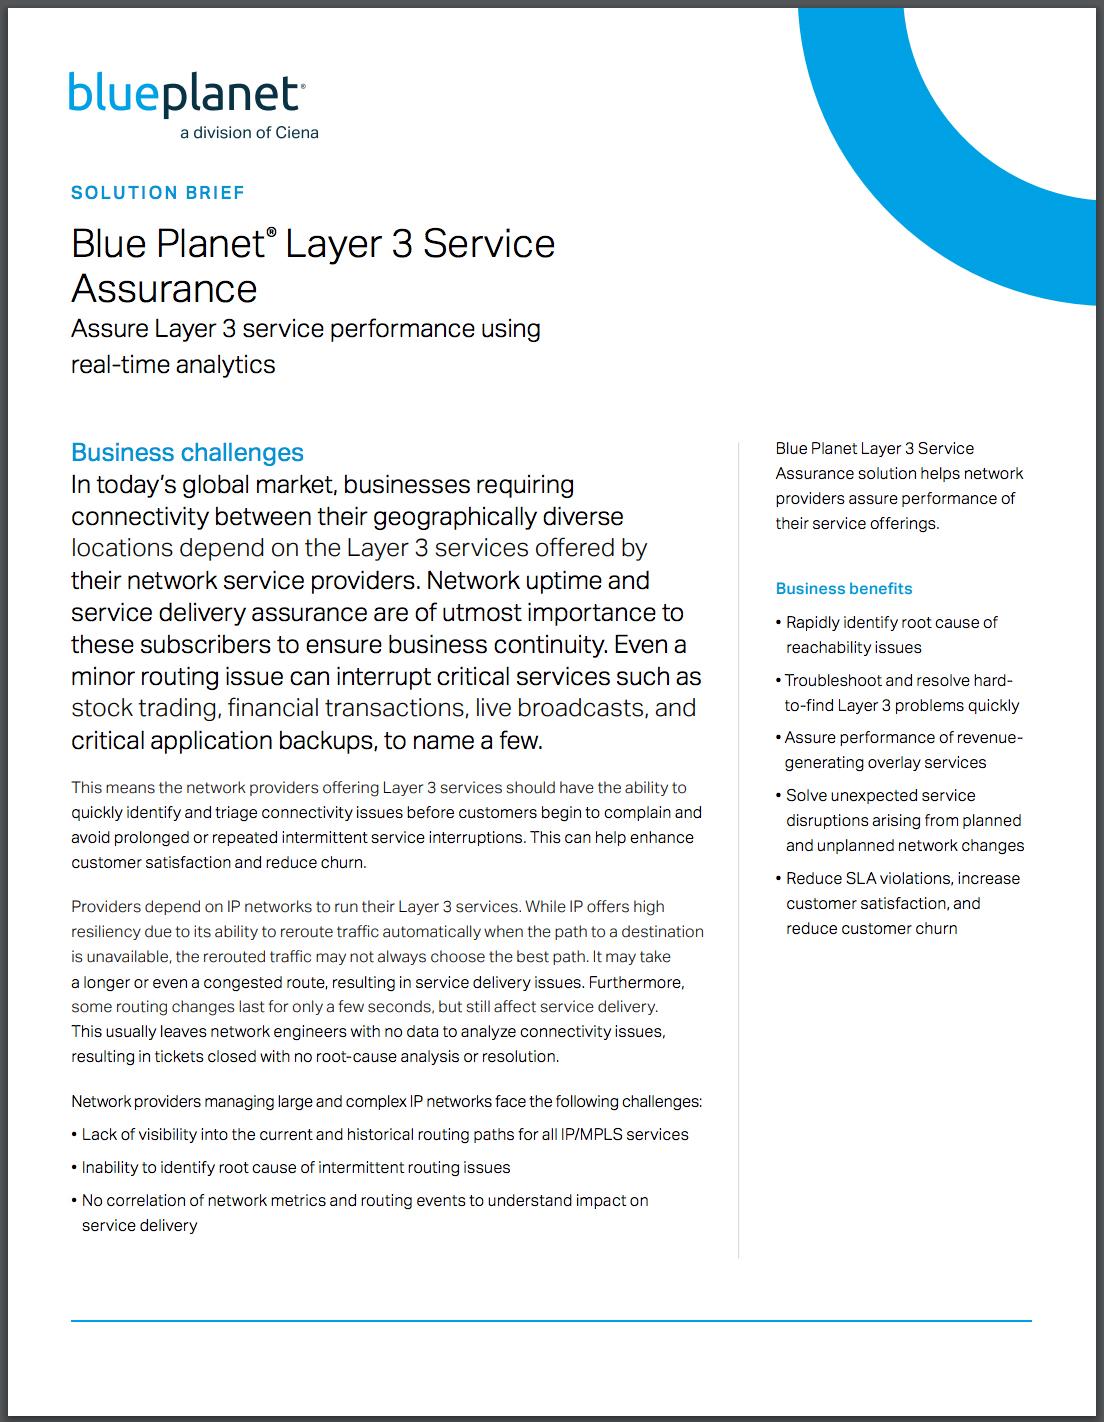 Blue Planet Layer 3 Service Assurance